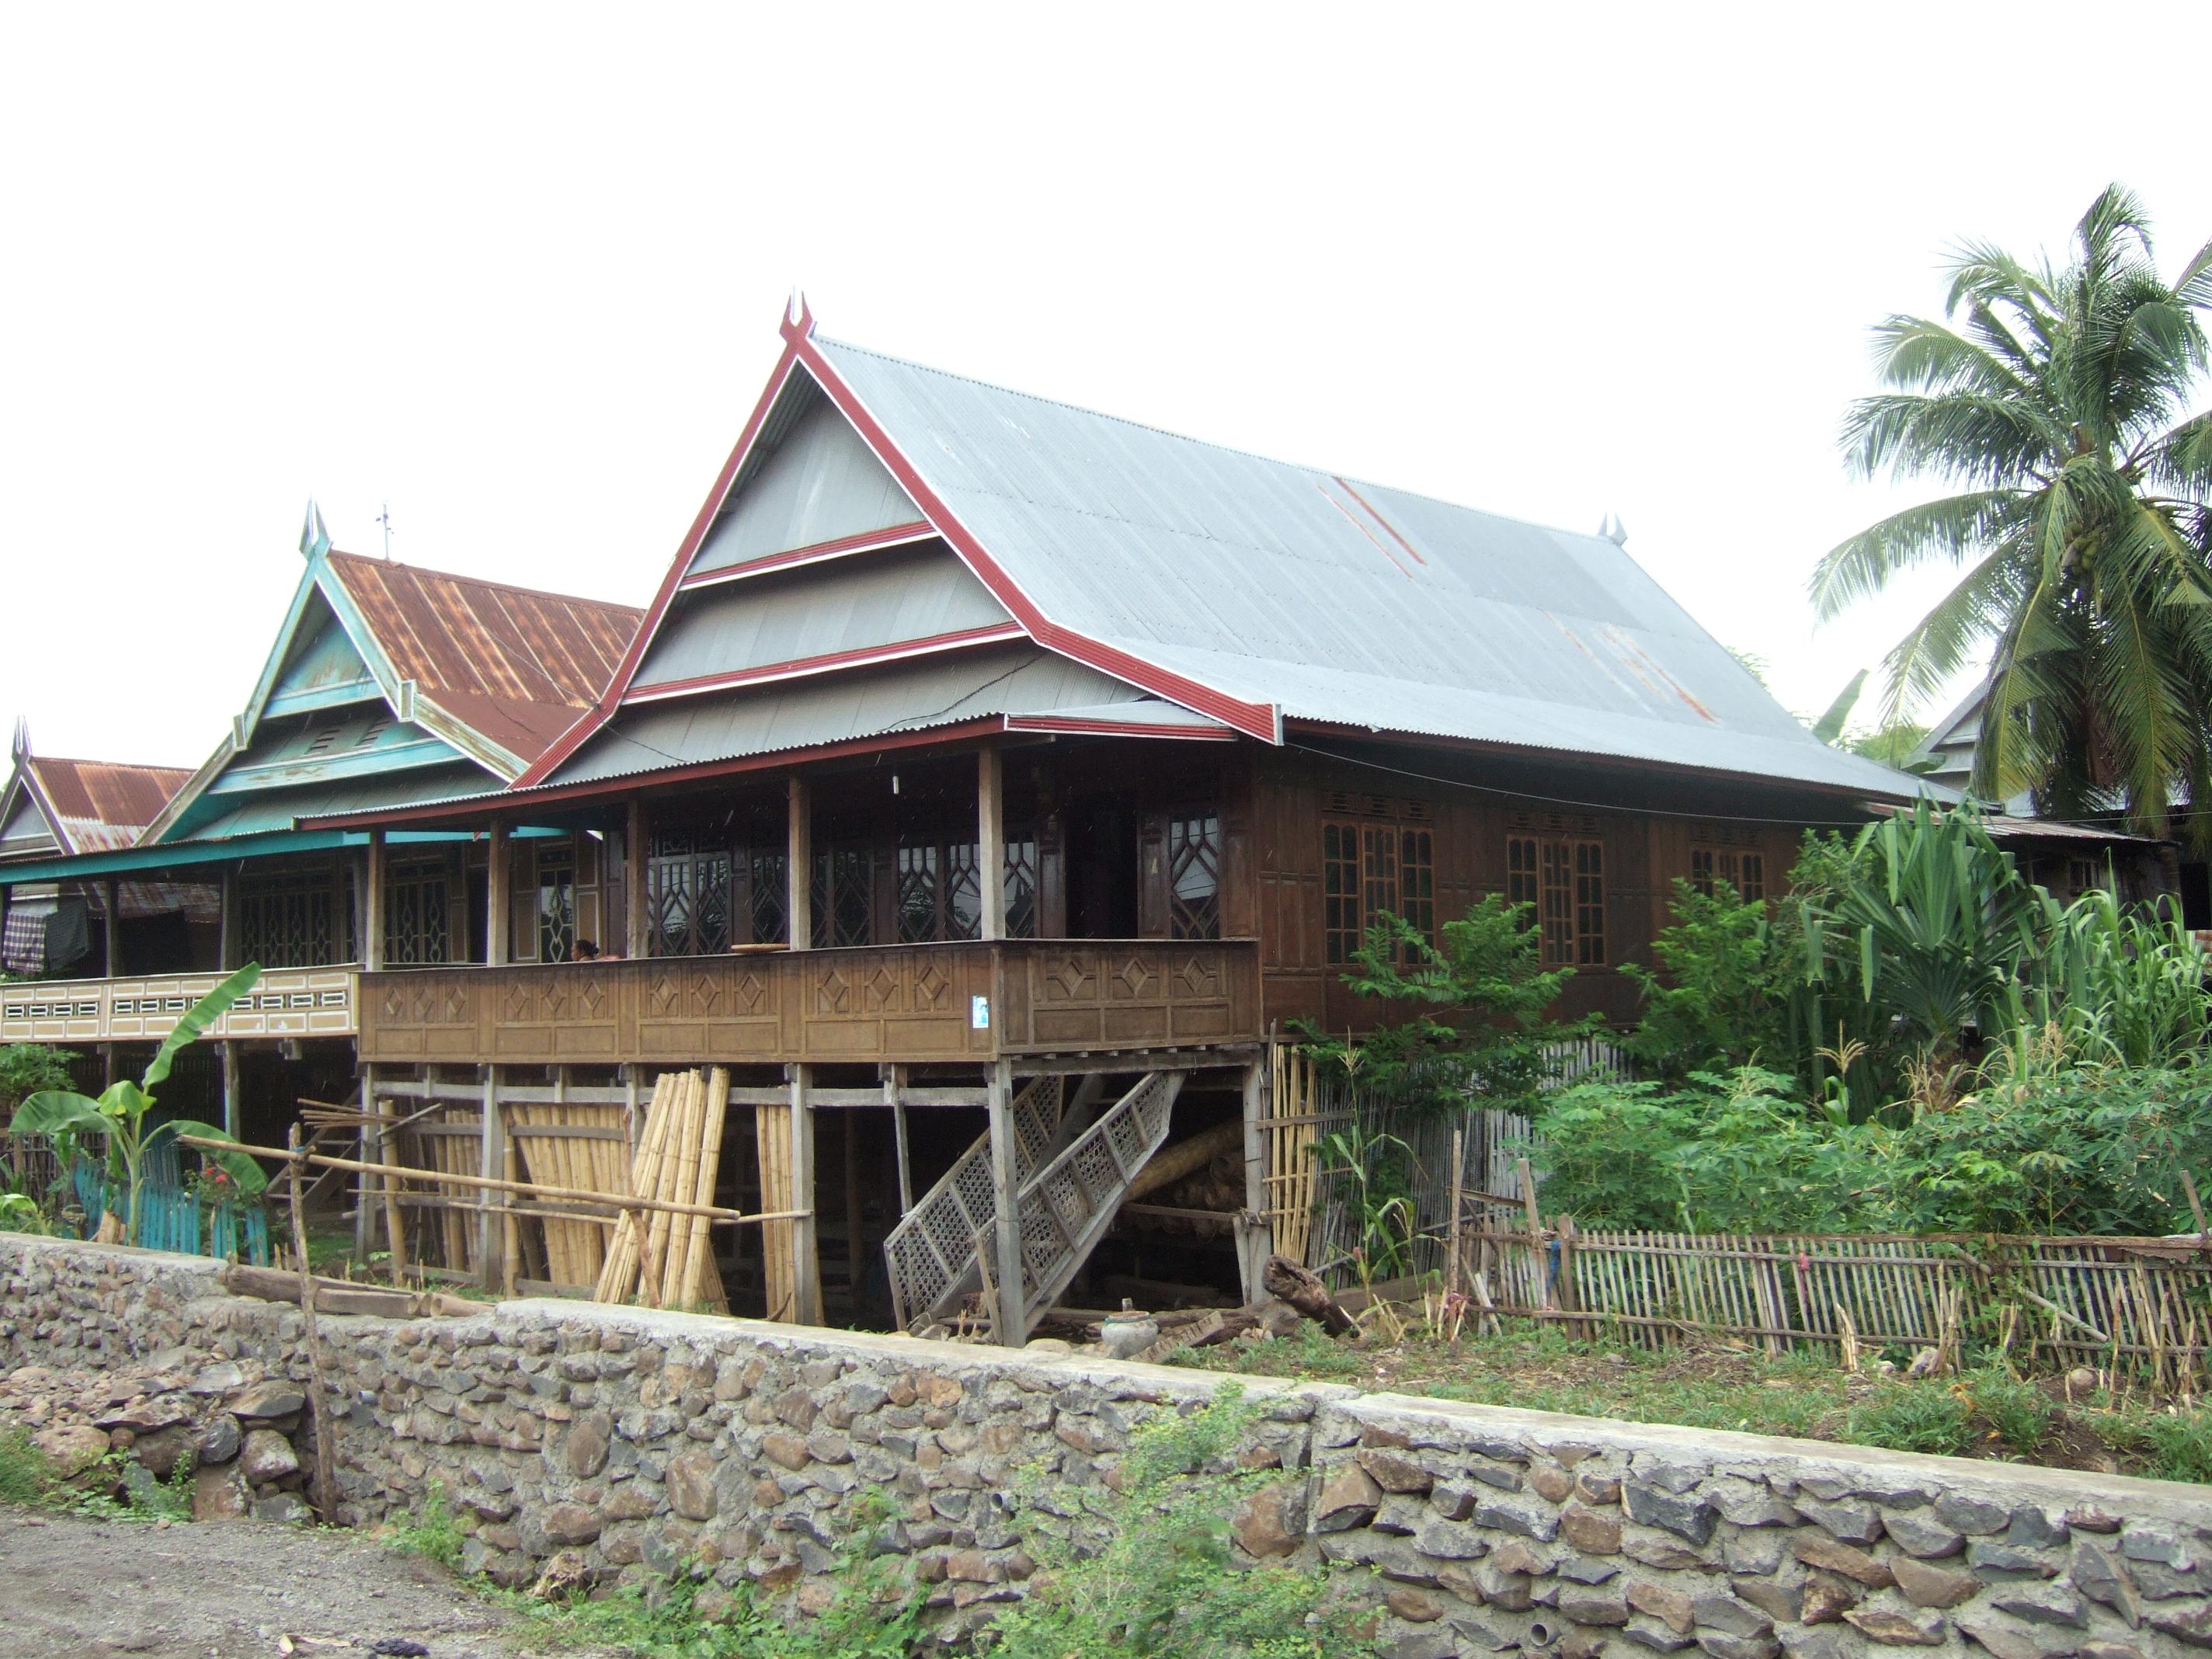 File Rumah Tradisional Makassar Bugis Bulukumba Jpg Wikimedia Commons